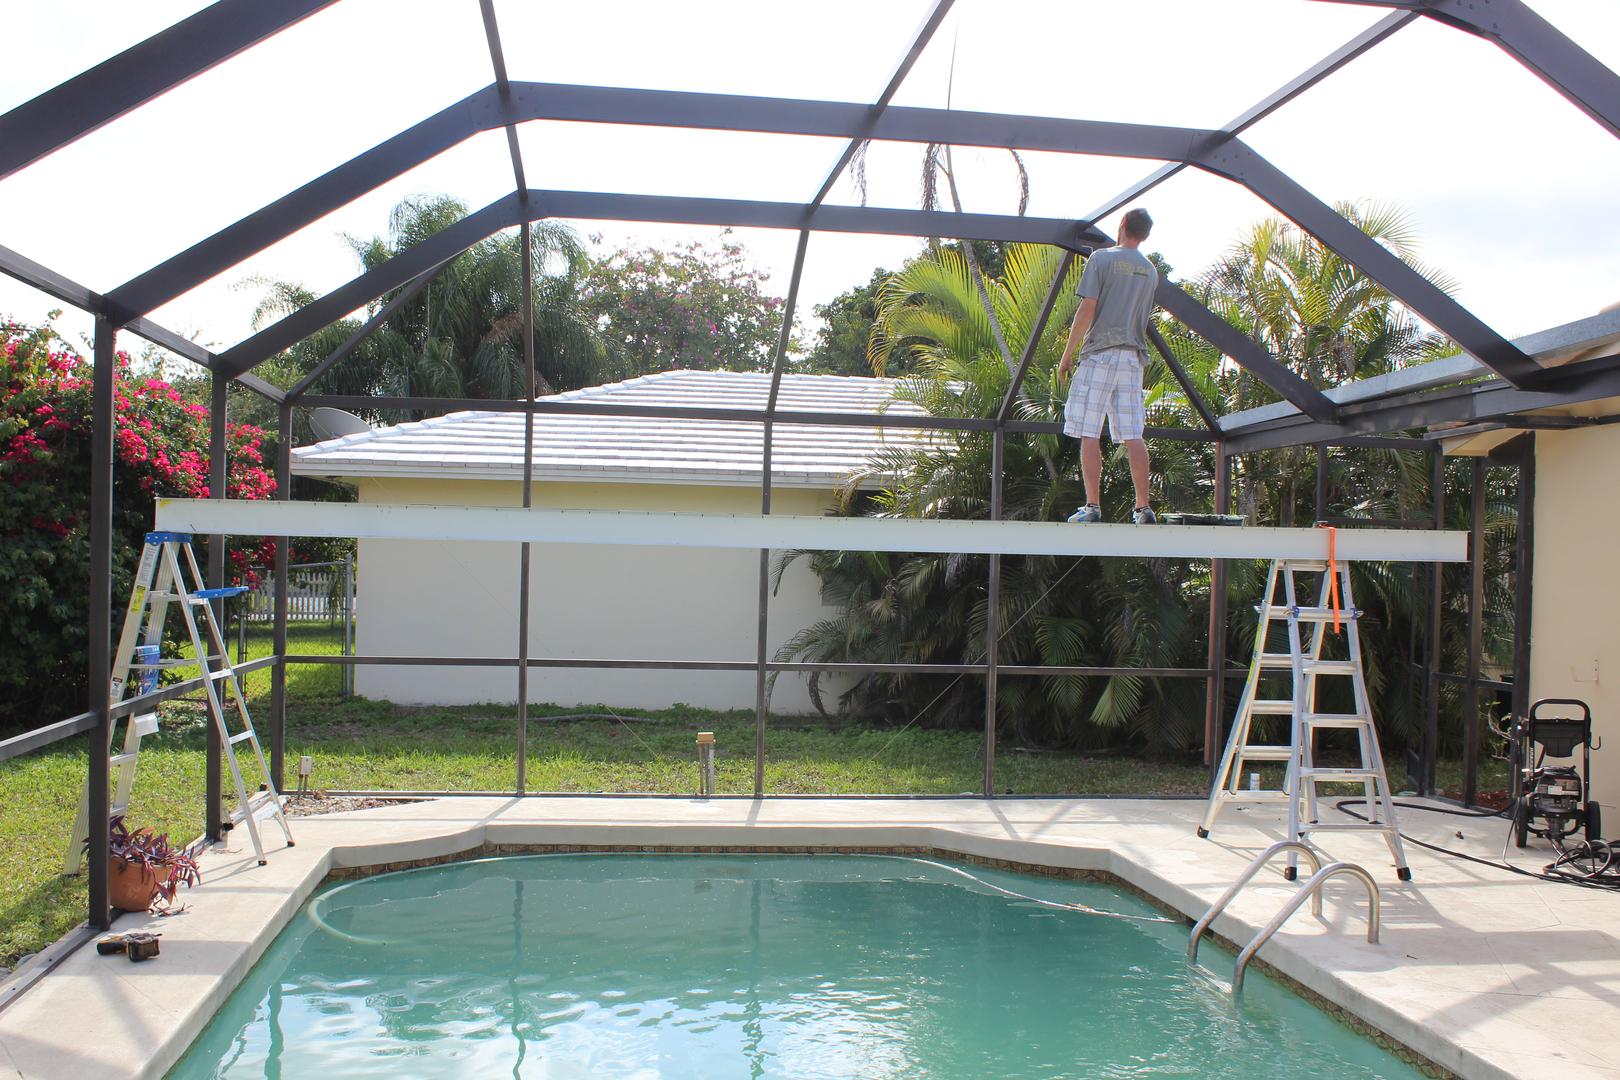 Rescreening a porch rescreening repair pool cages tampa for Pool enclosure design software